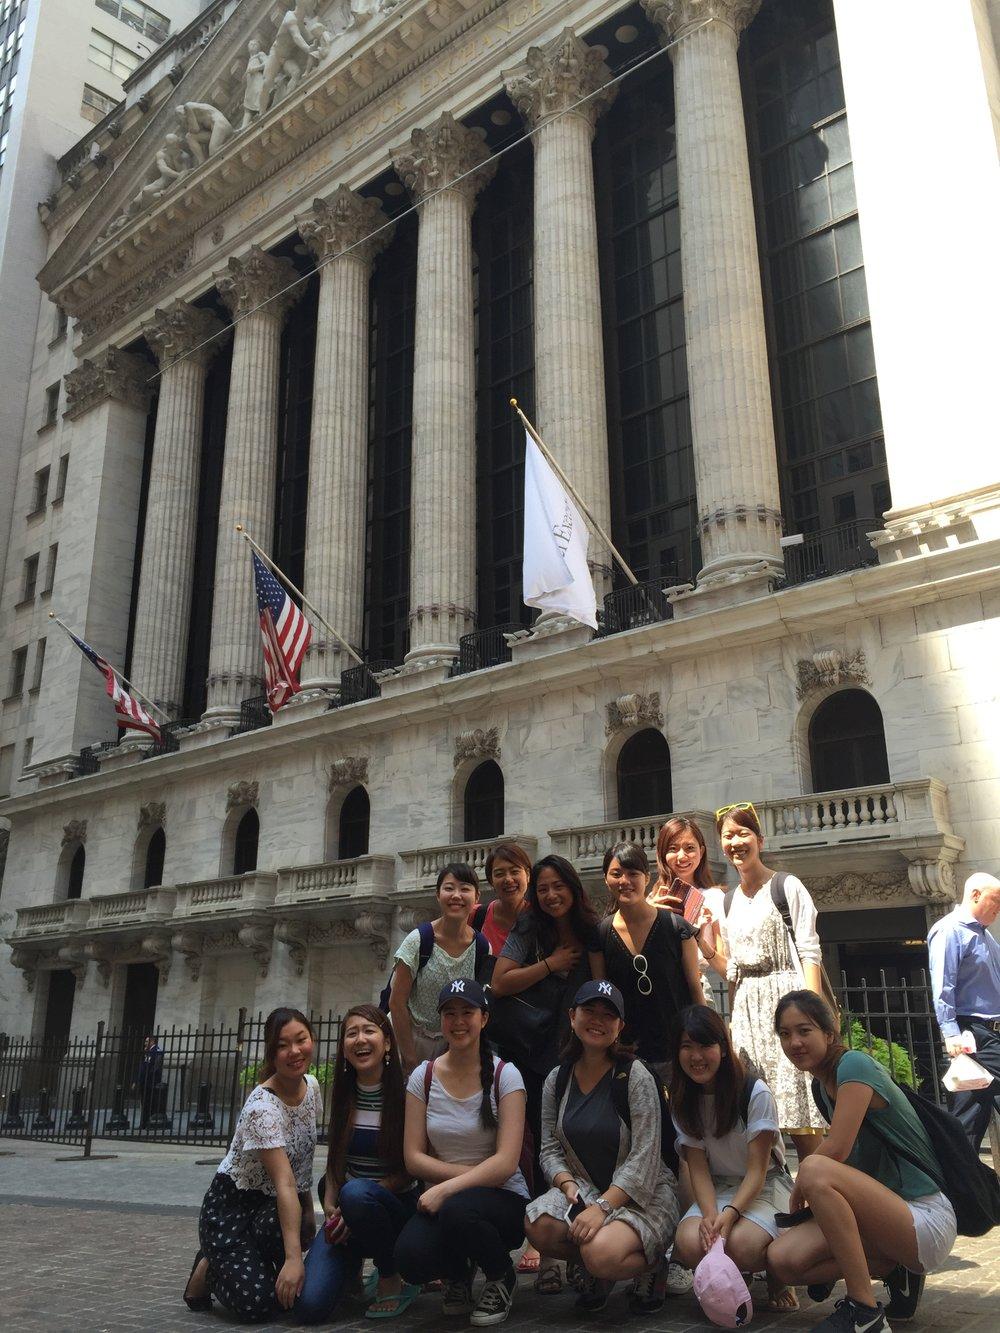 Copy of Wall Street